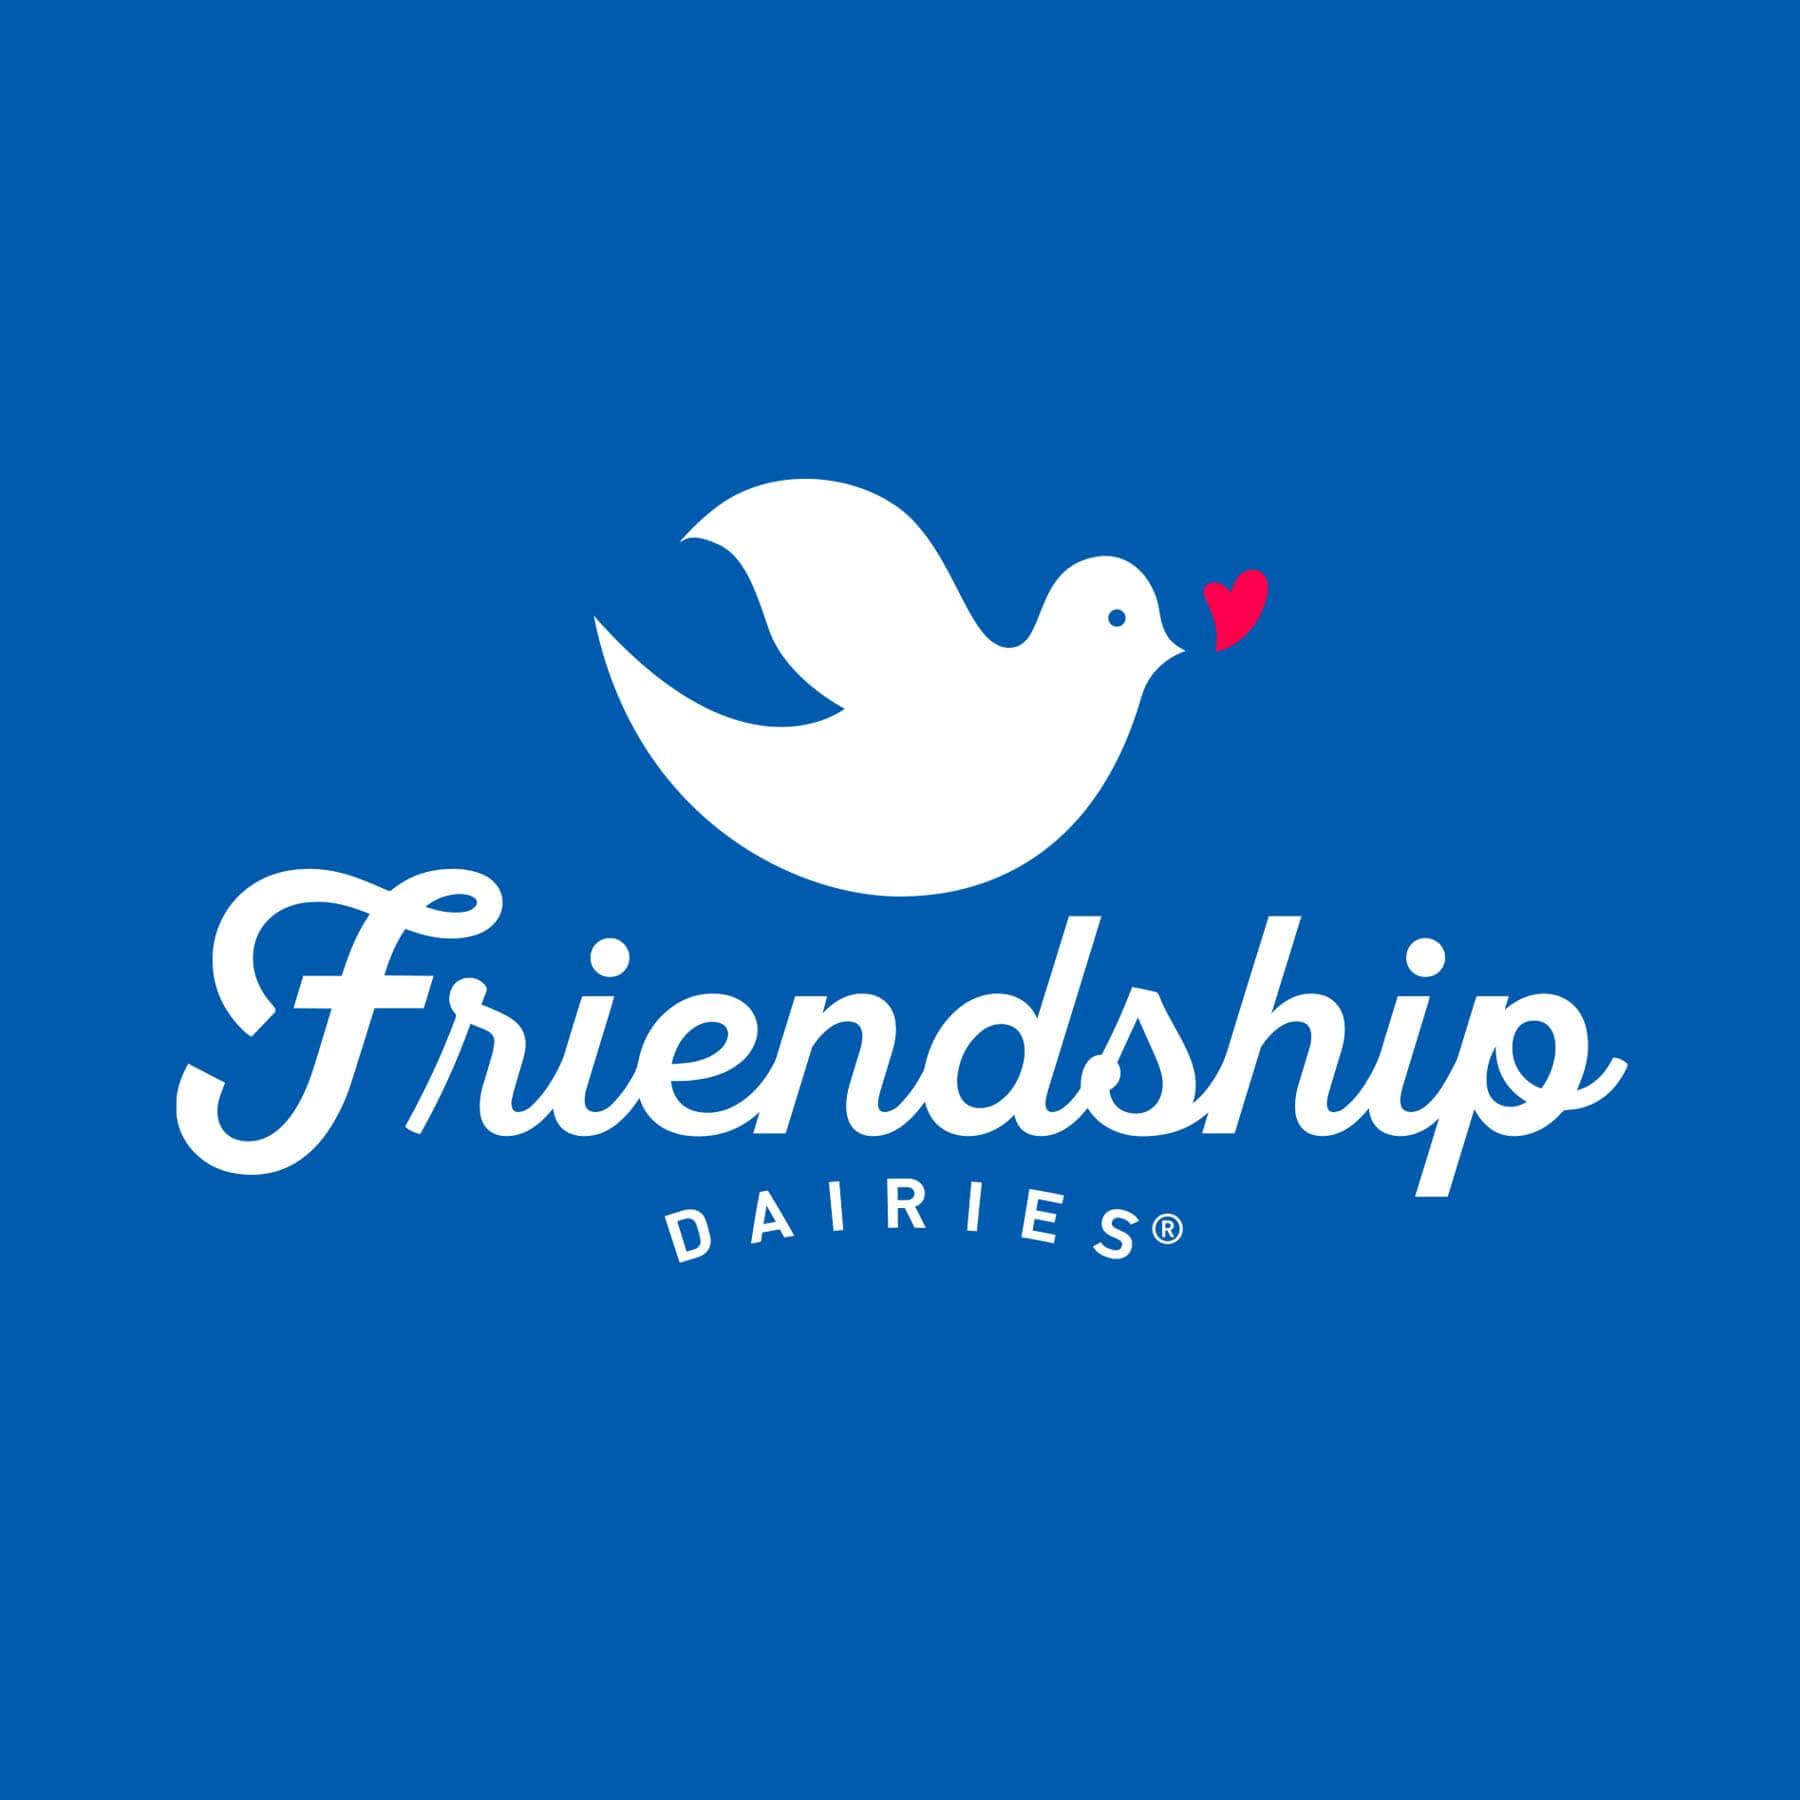 Friendship Dairies Logo